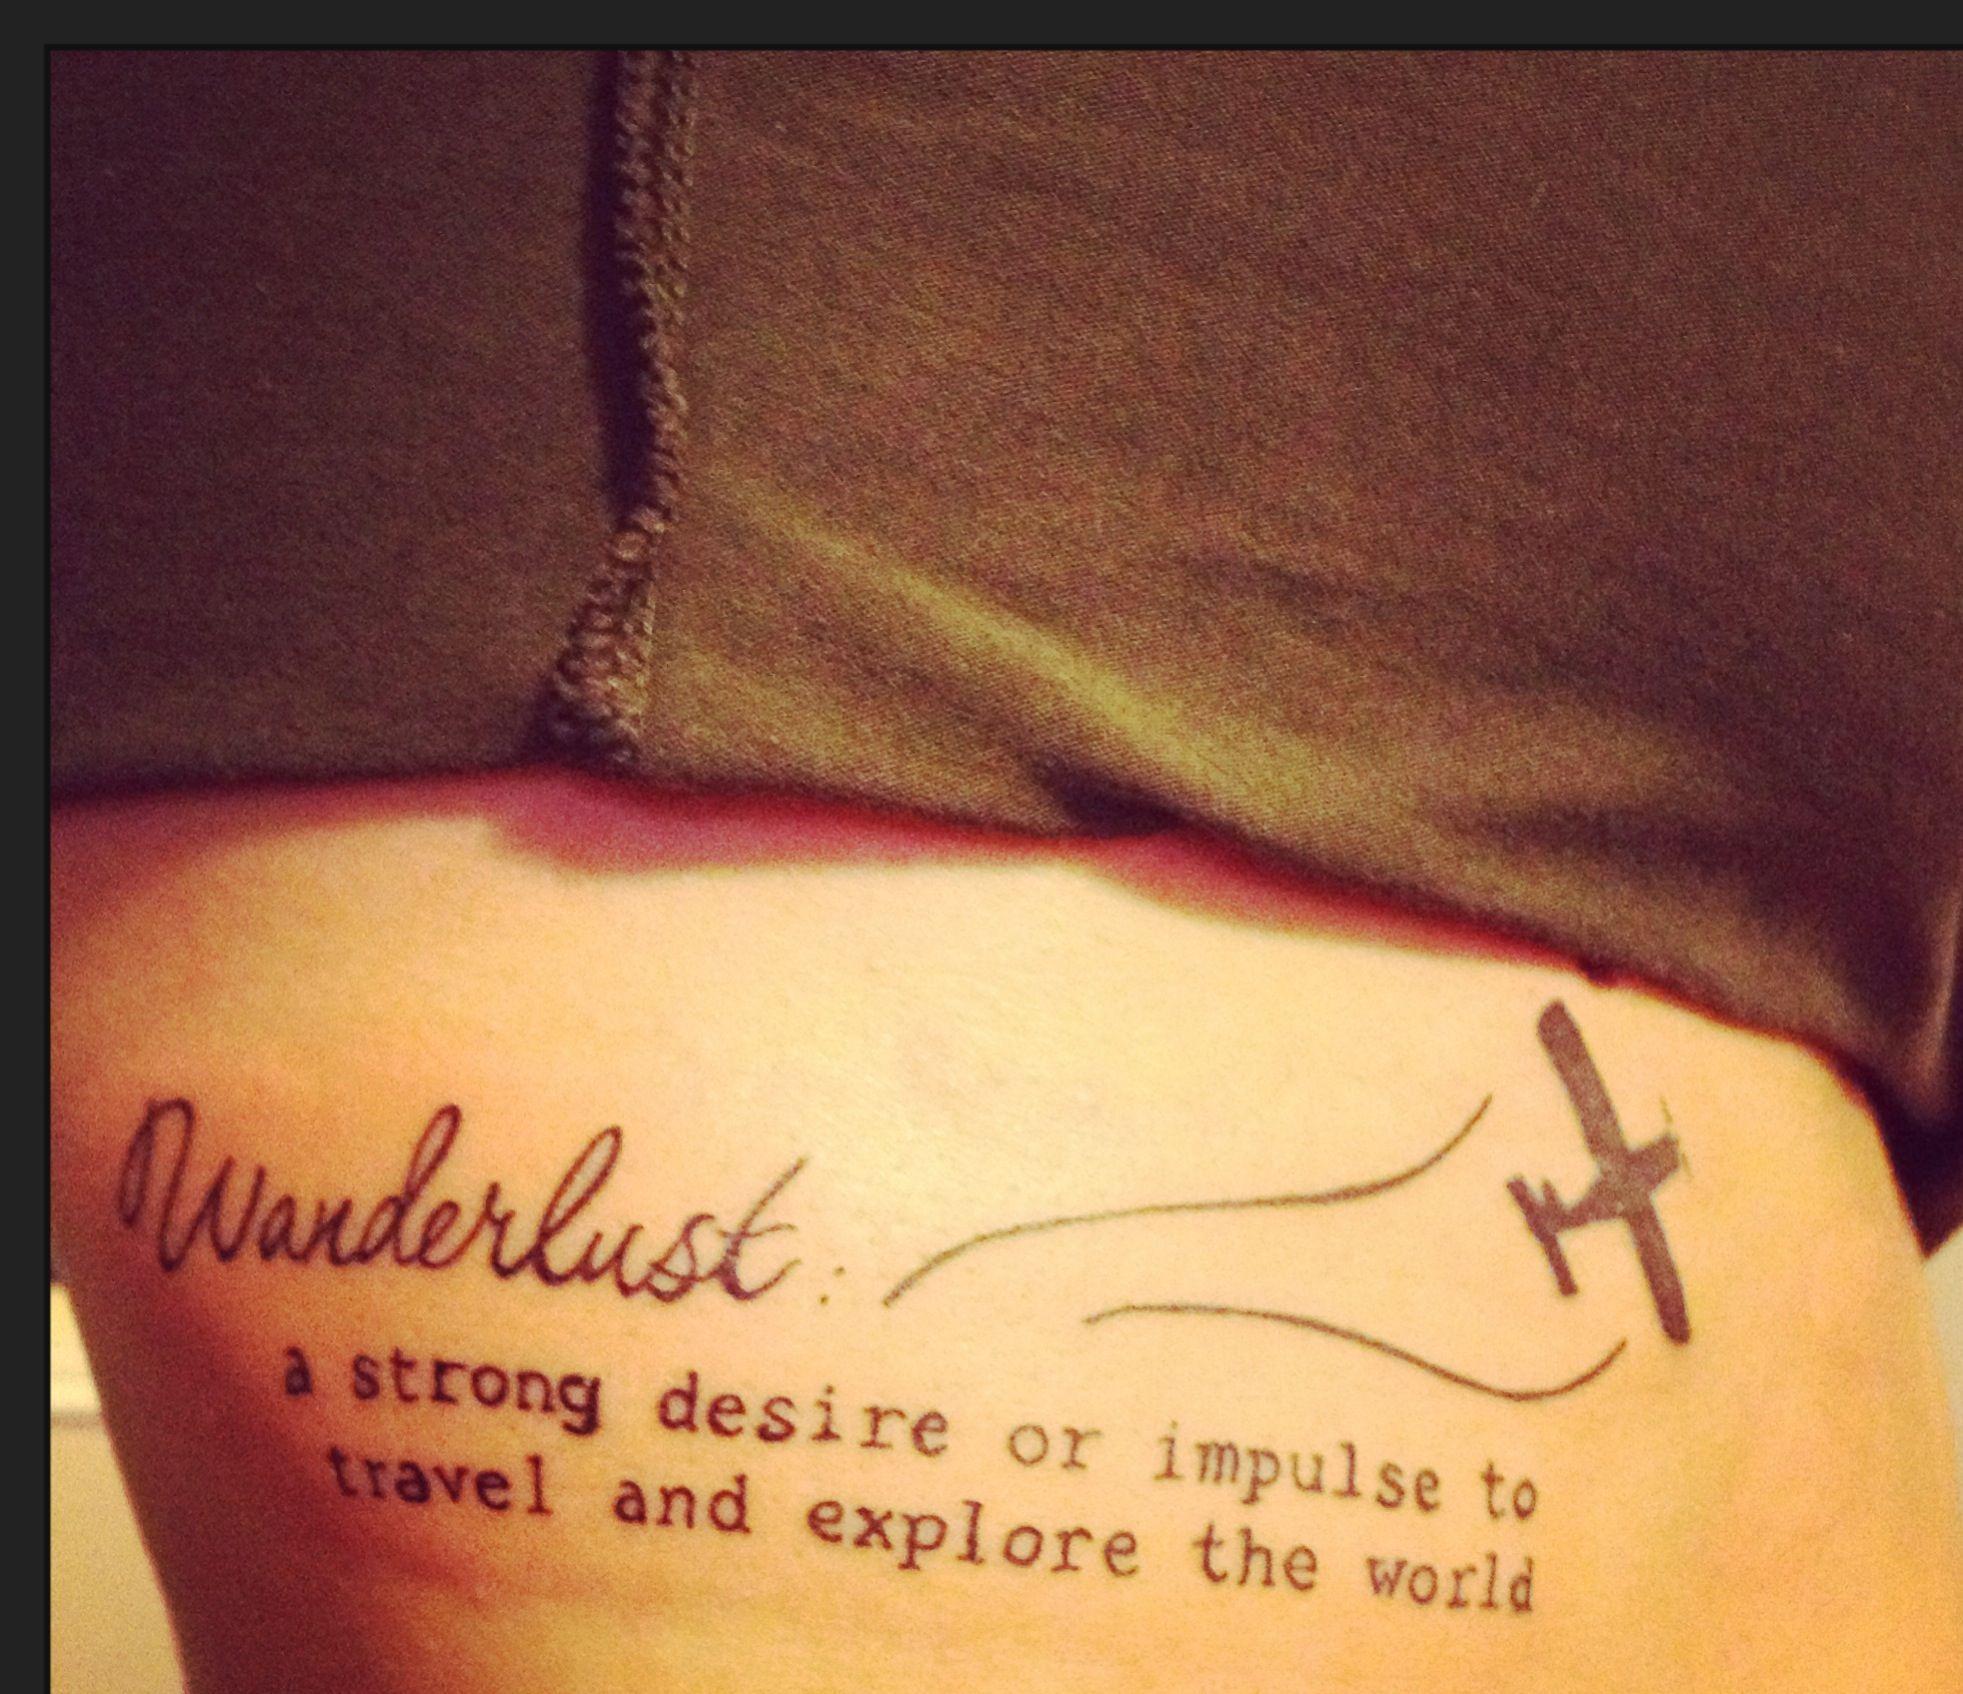 For The Love Of Travel Rib Tattoo Tattoo Pinterest